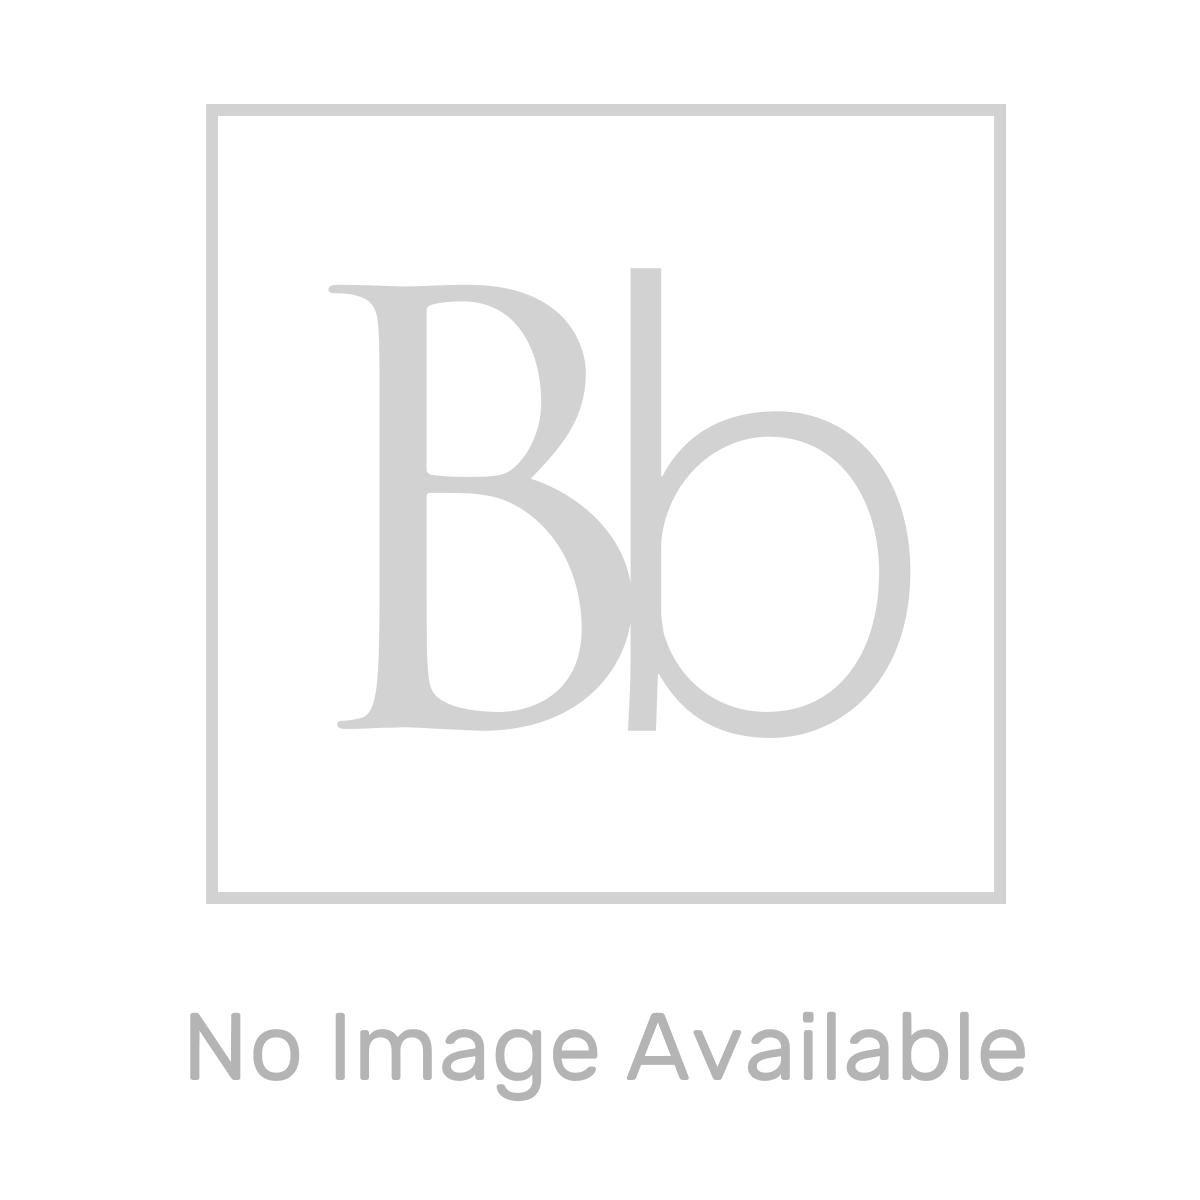 Zenith Halton Waterfall Bath Shower Mixer Tap